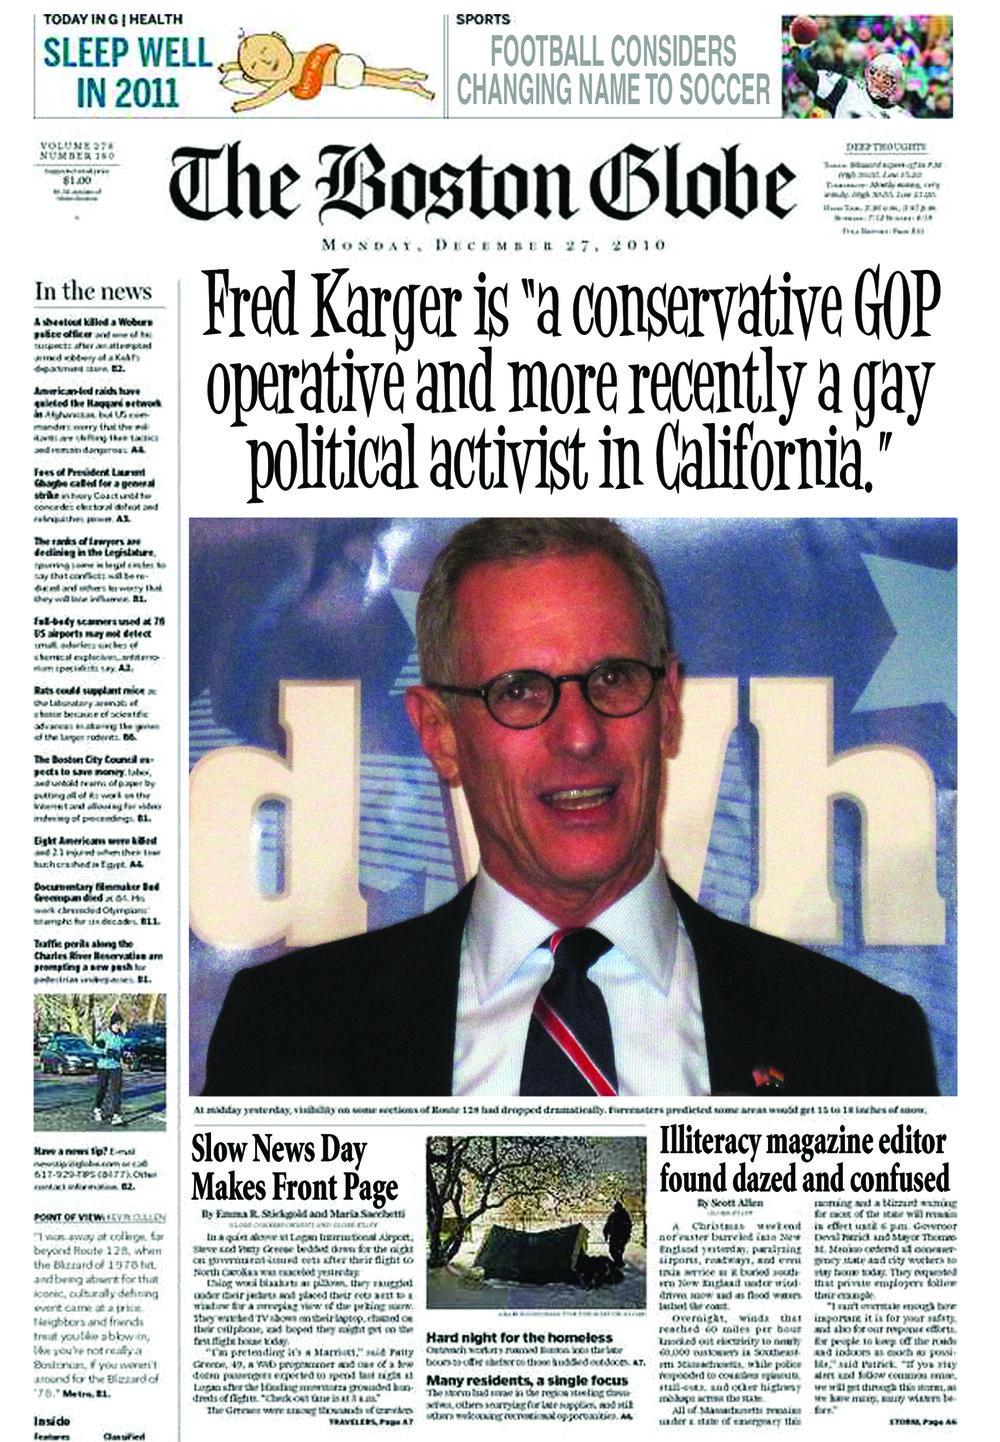 Fred Karger criticizes Mitt Romney's living arrangements.